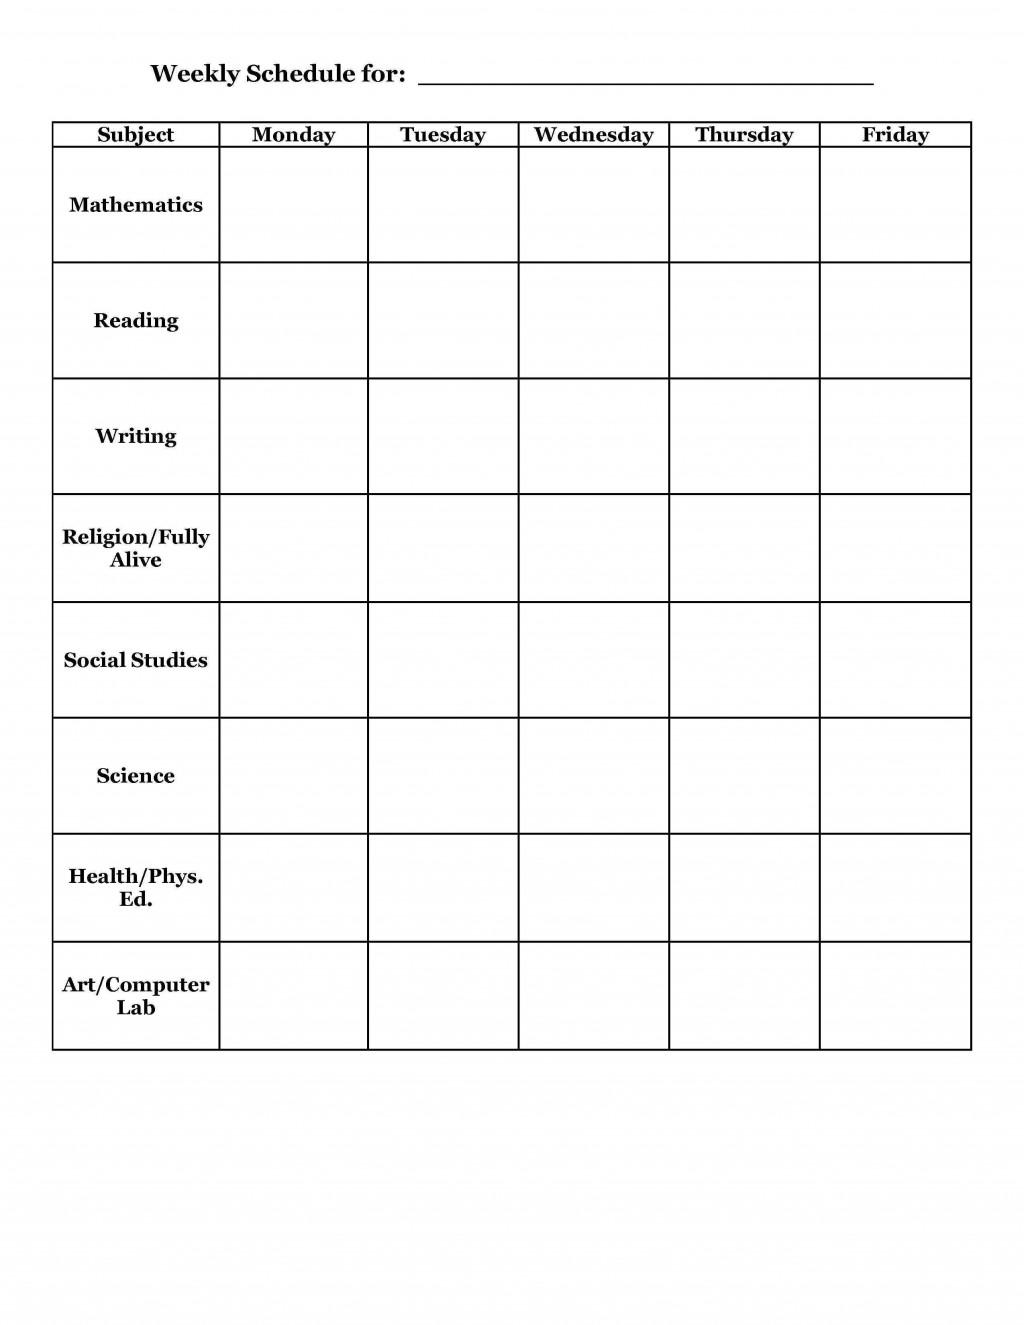 002 Shocking Weekly School Planner Template Sample  Lesson Plan Primary Planning Schedule PrintableLarge